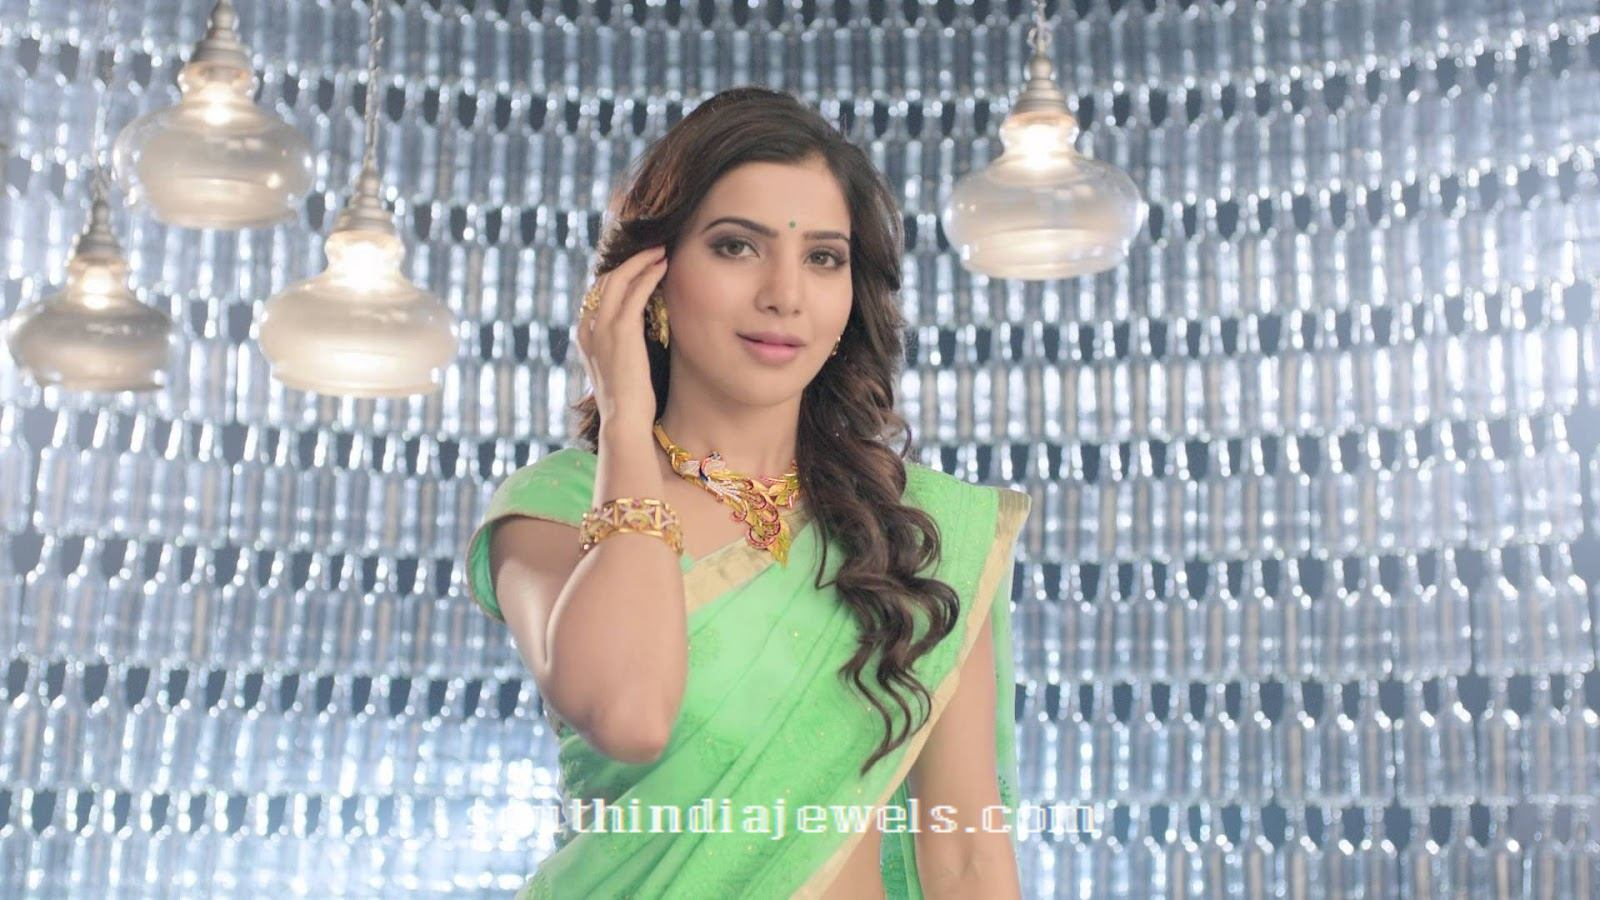 Celebrity Jewellery Designs   Celebrity Wedding Jewellery Designs